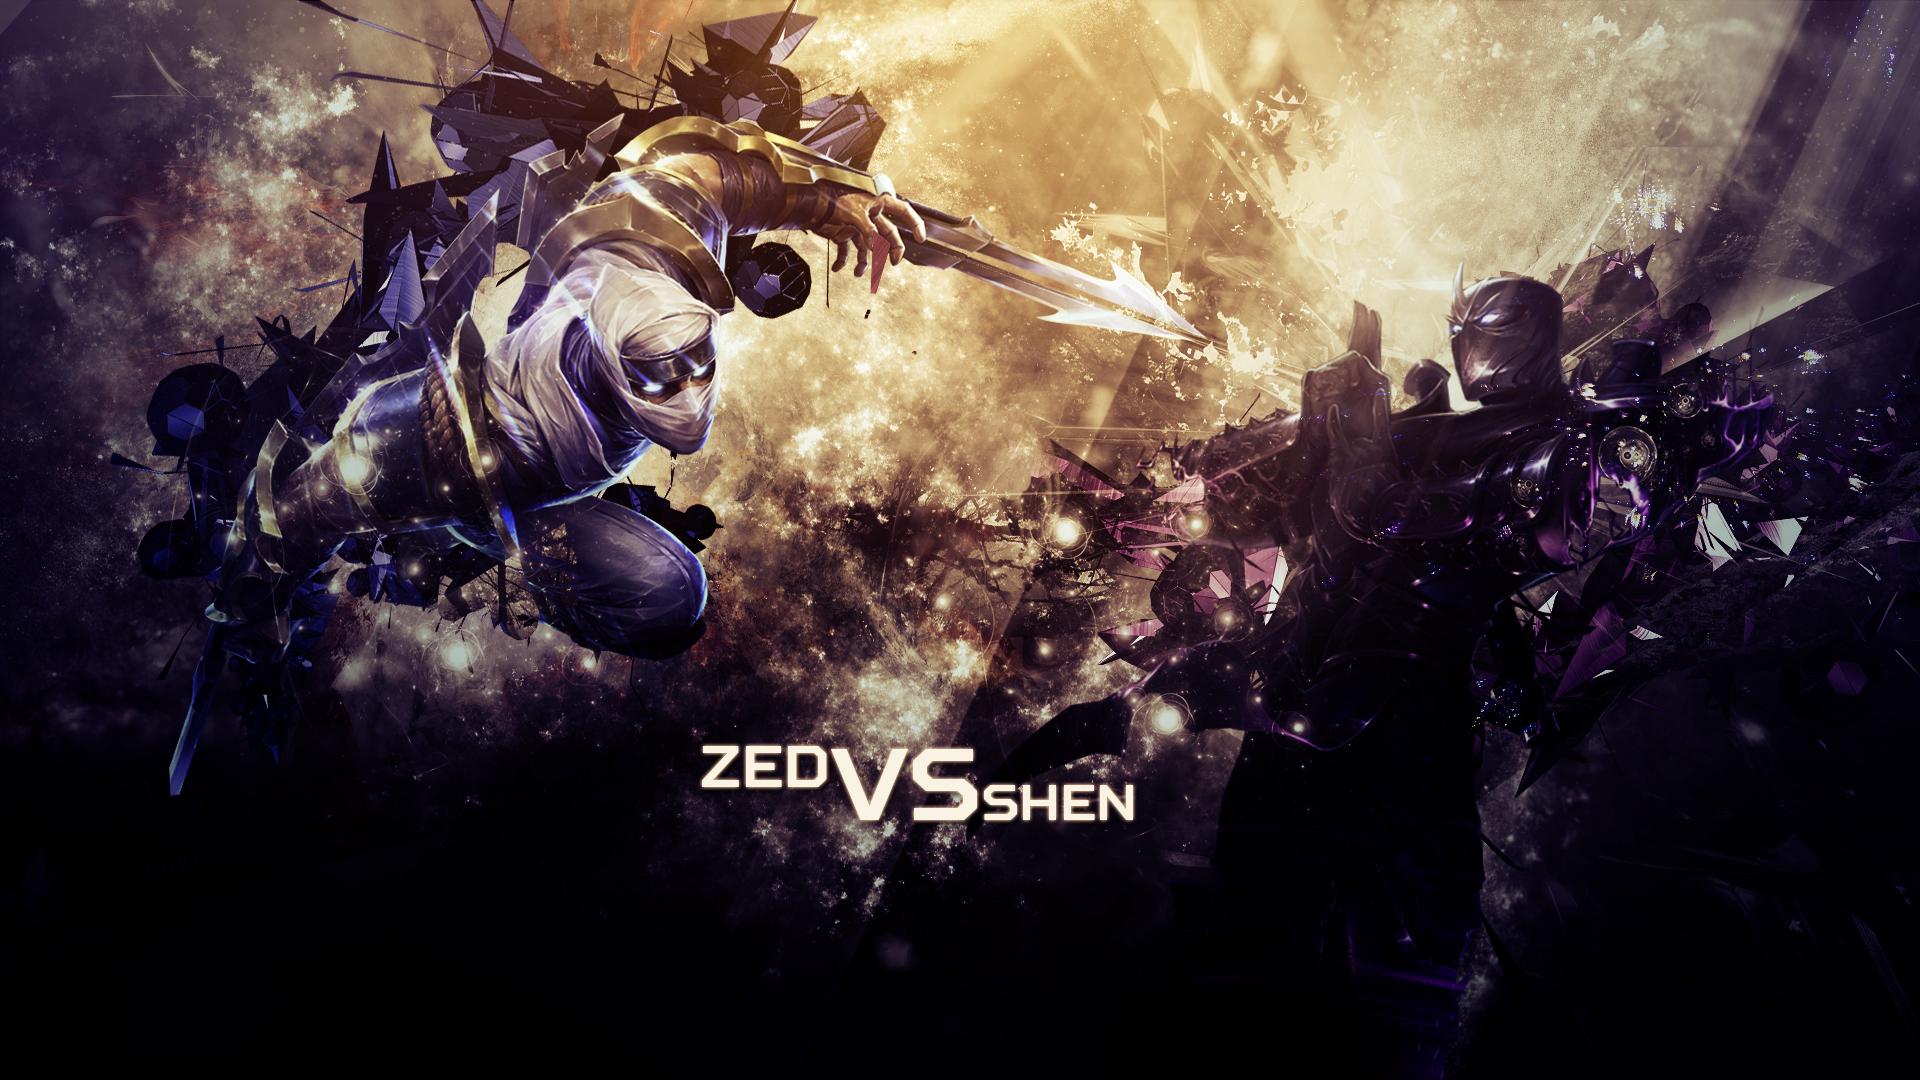 Zed vs Shen wallpaper